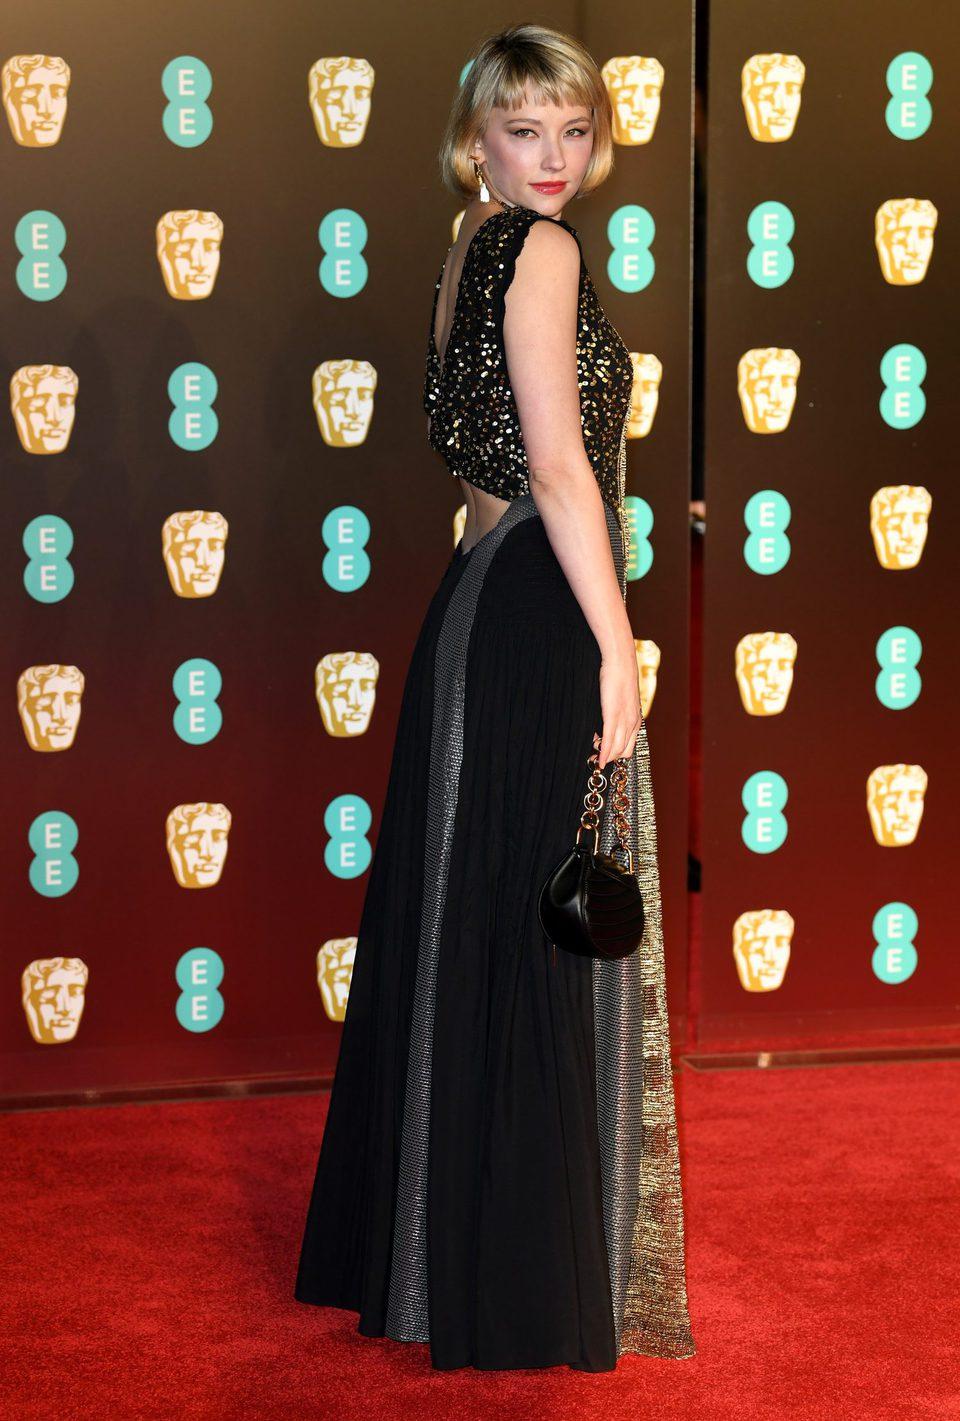 Haley Bennett at the BAFTAs 2018 red carpet